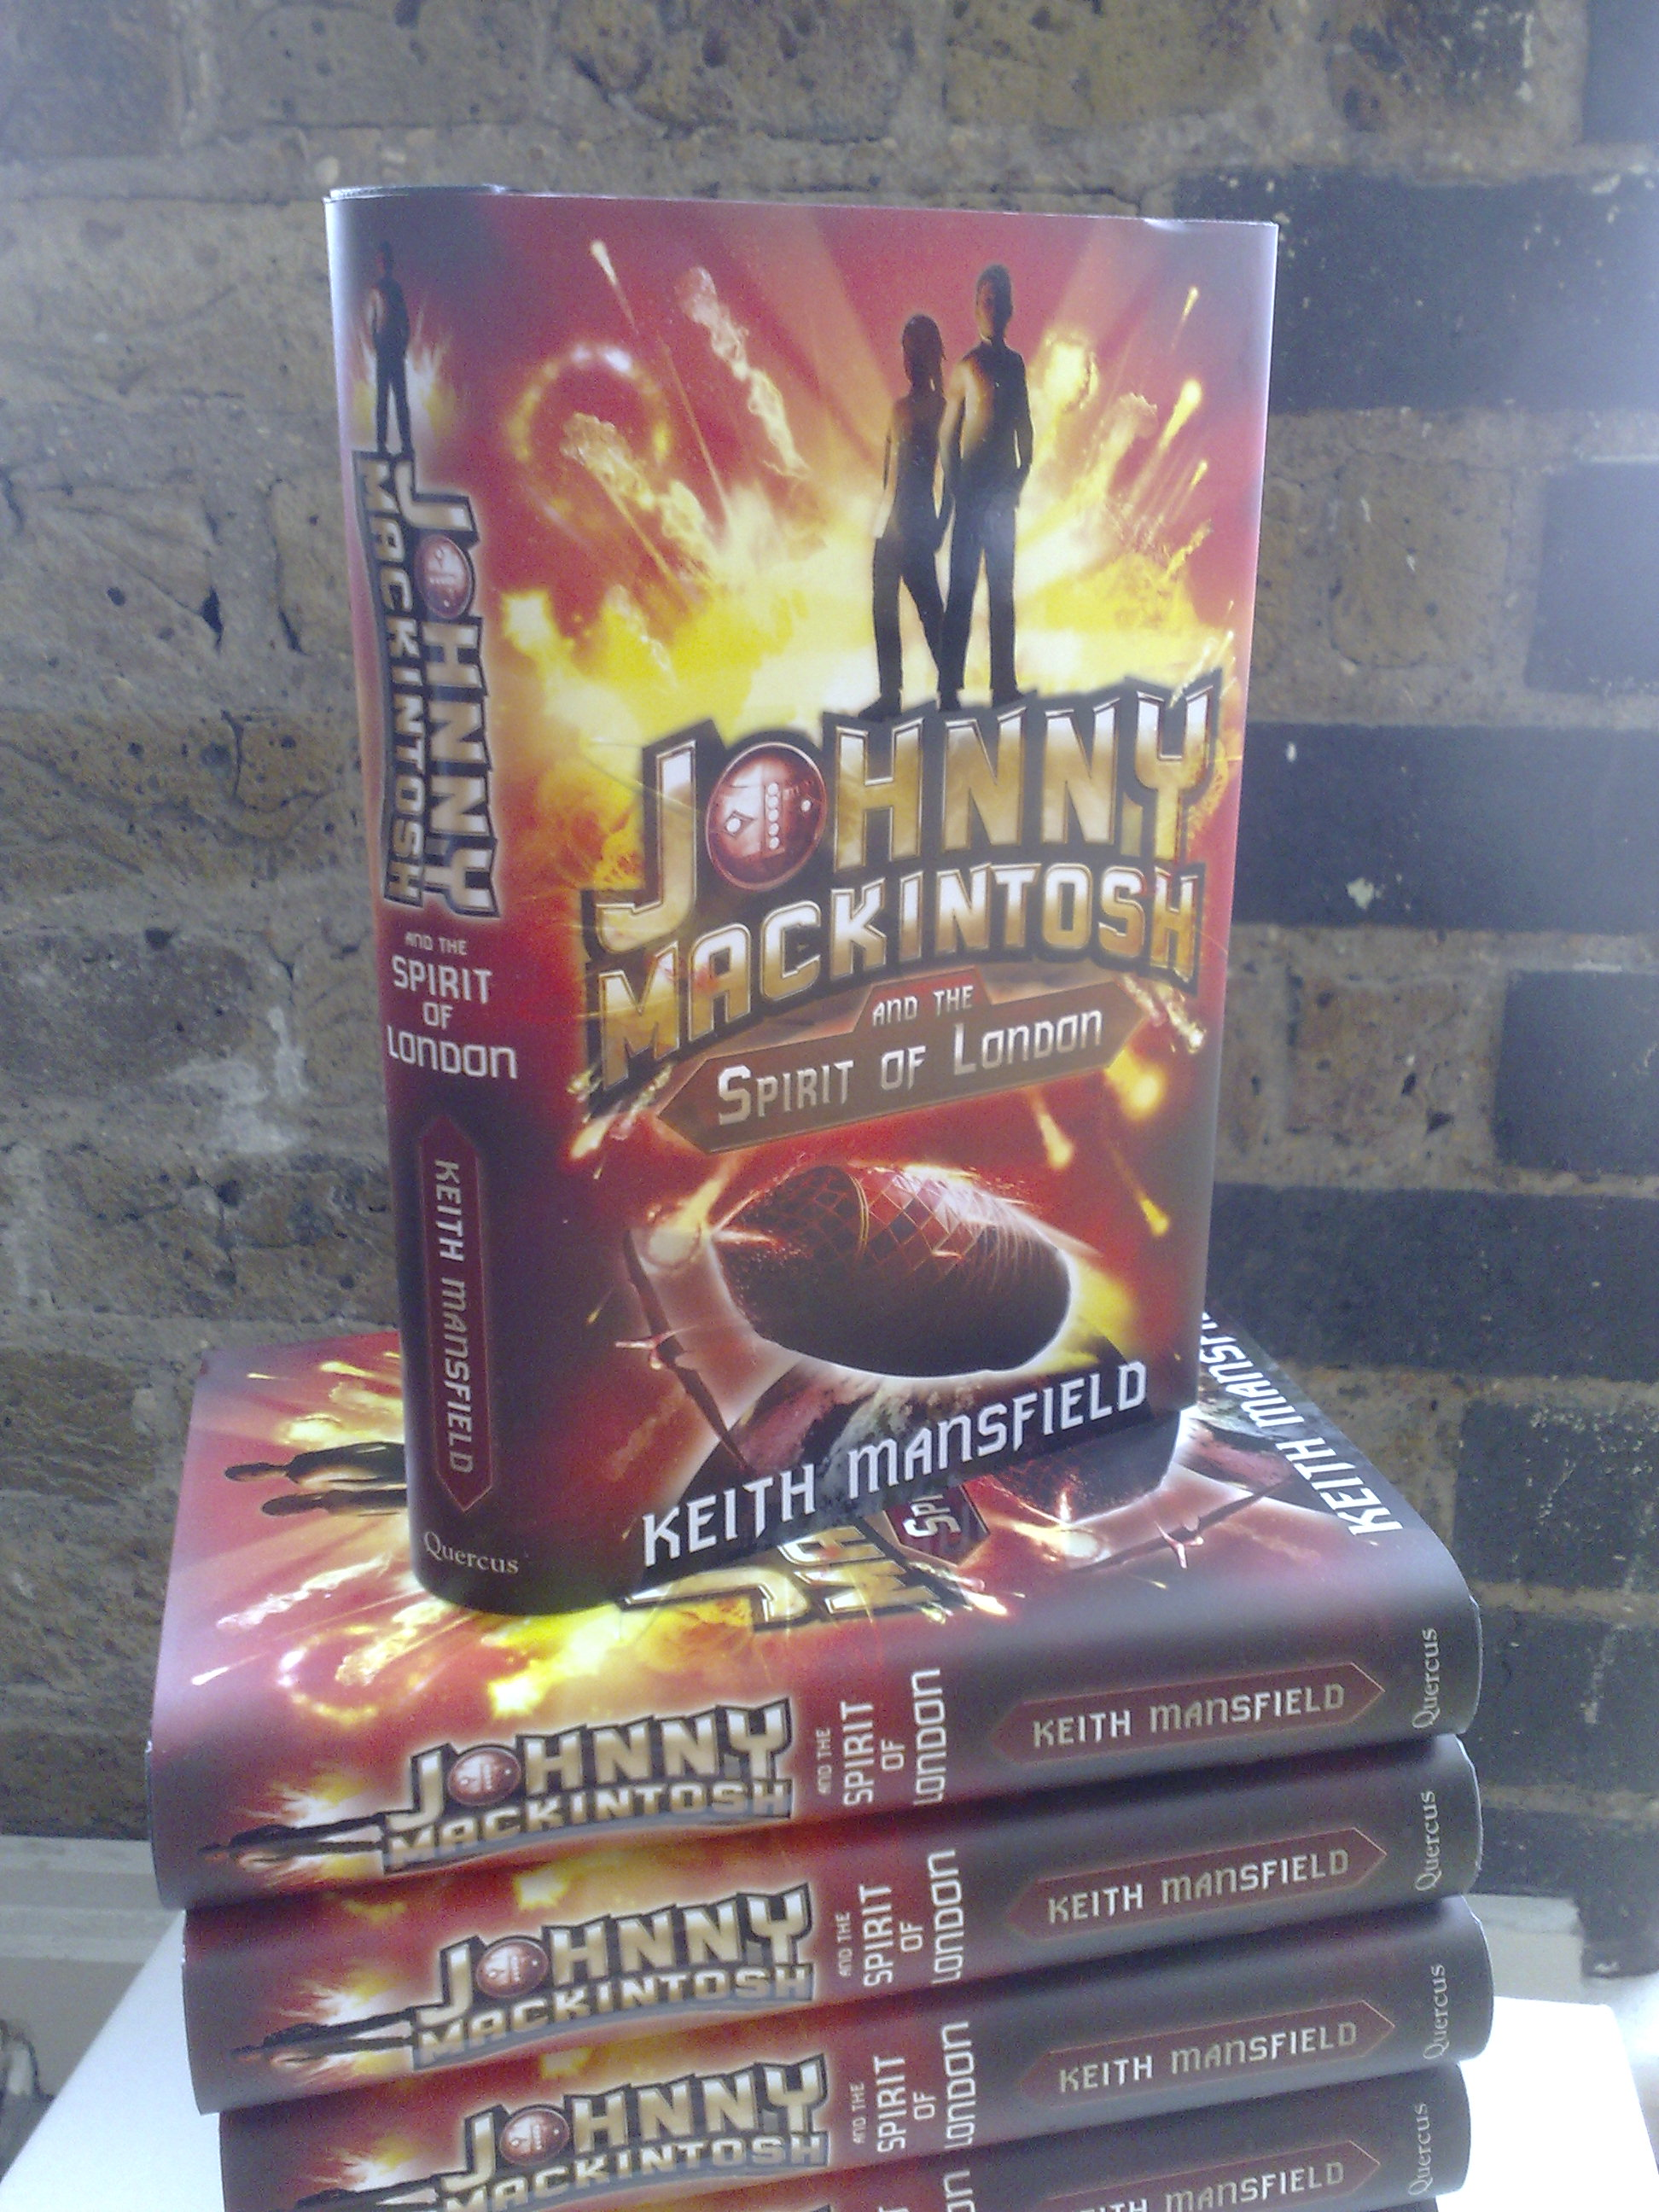 Johnny Mackintosh and the Spirit of London books